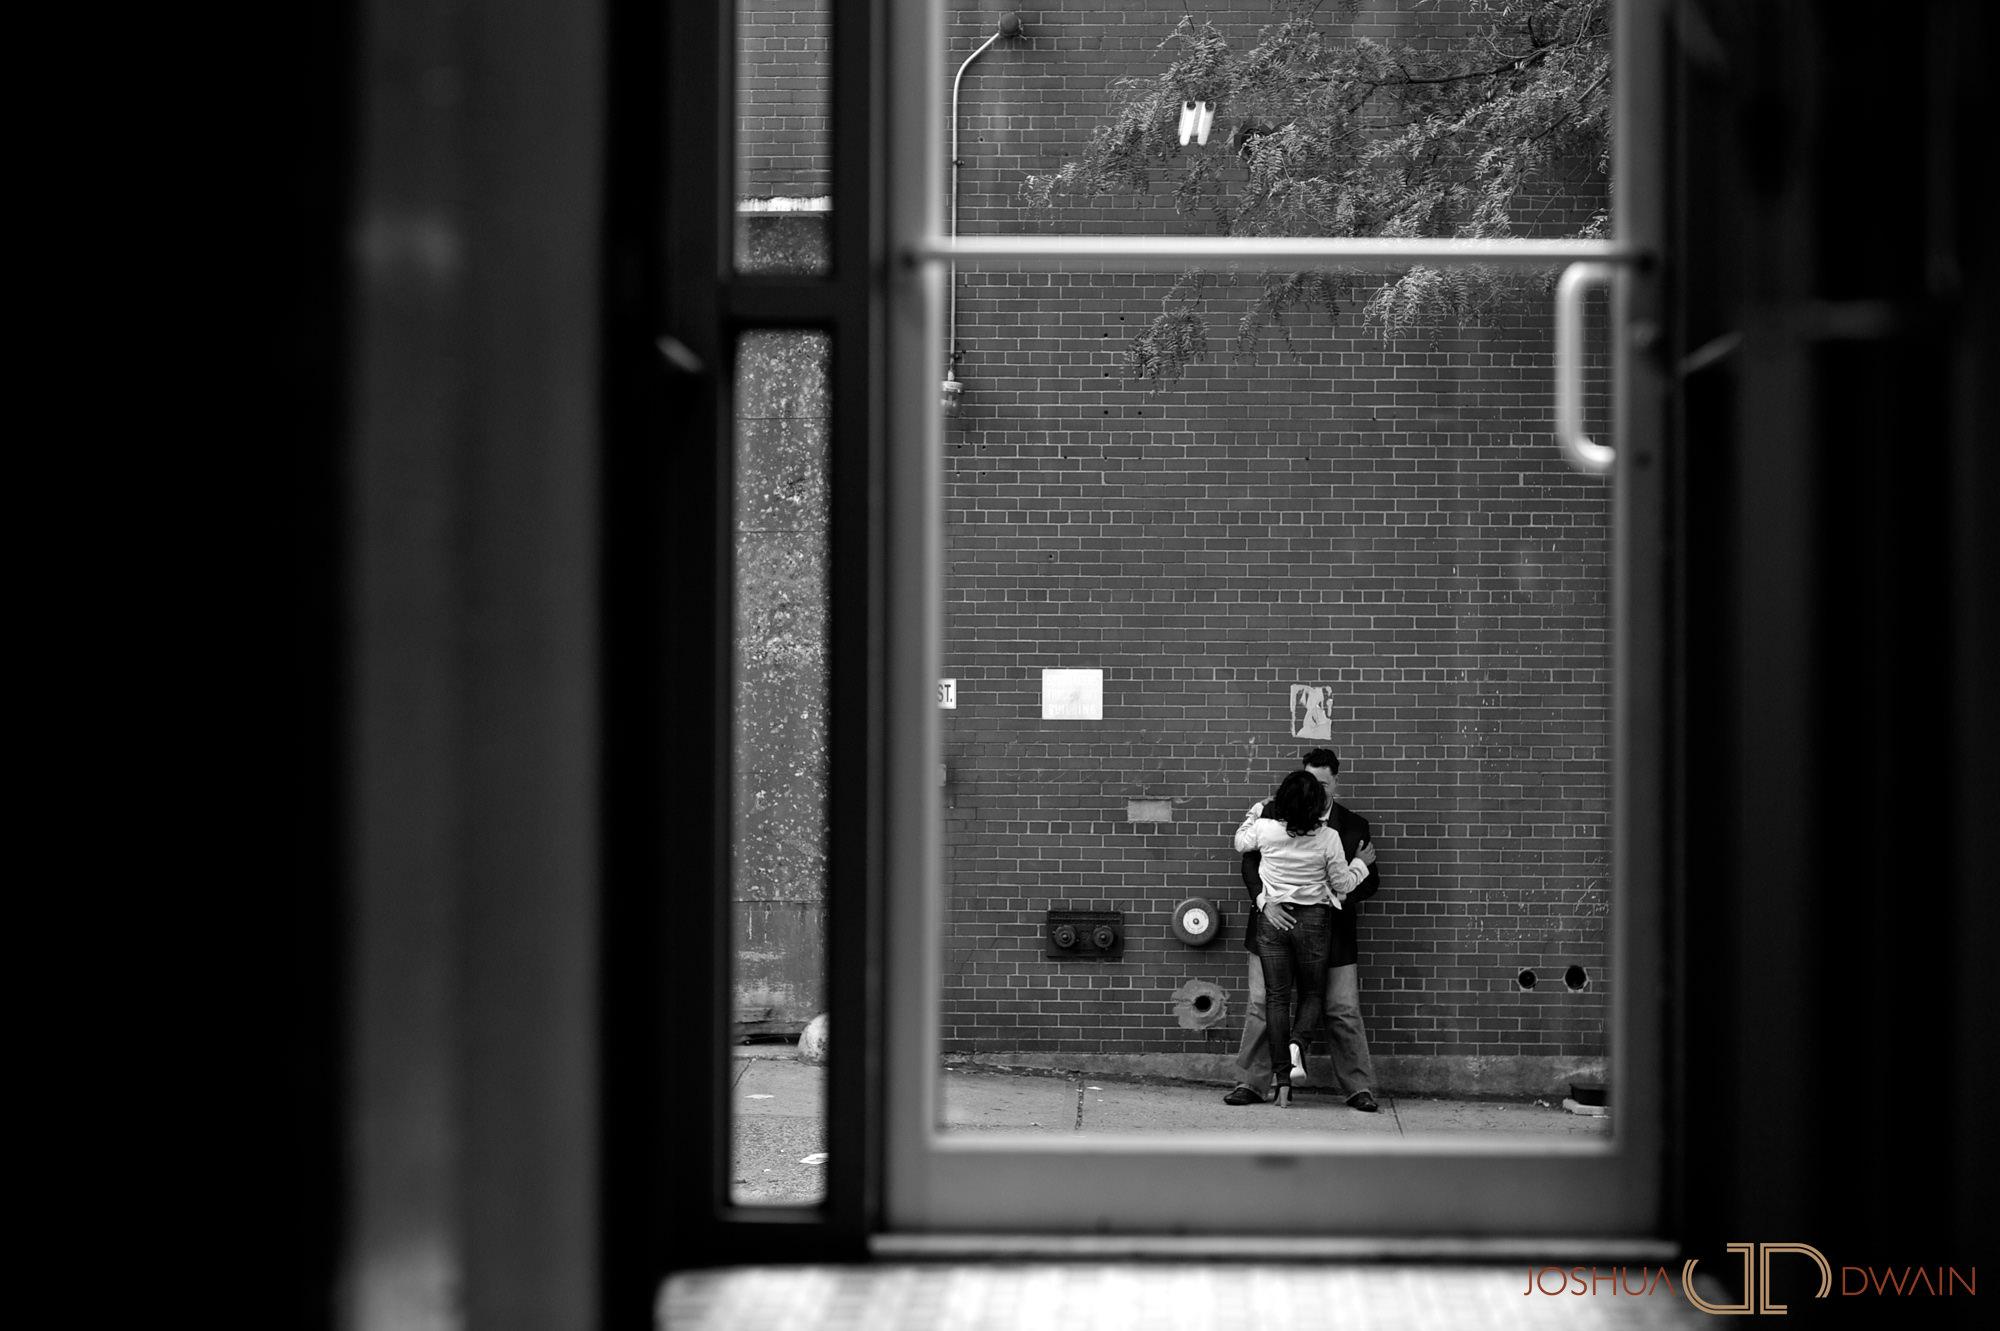 abbey-rafael-012-ink48new-york-citywedding-photographer-joshua-dwain-2012-10-05_ar_038